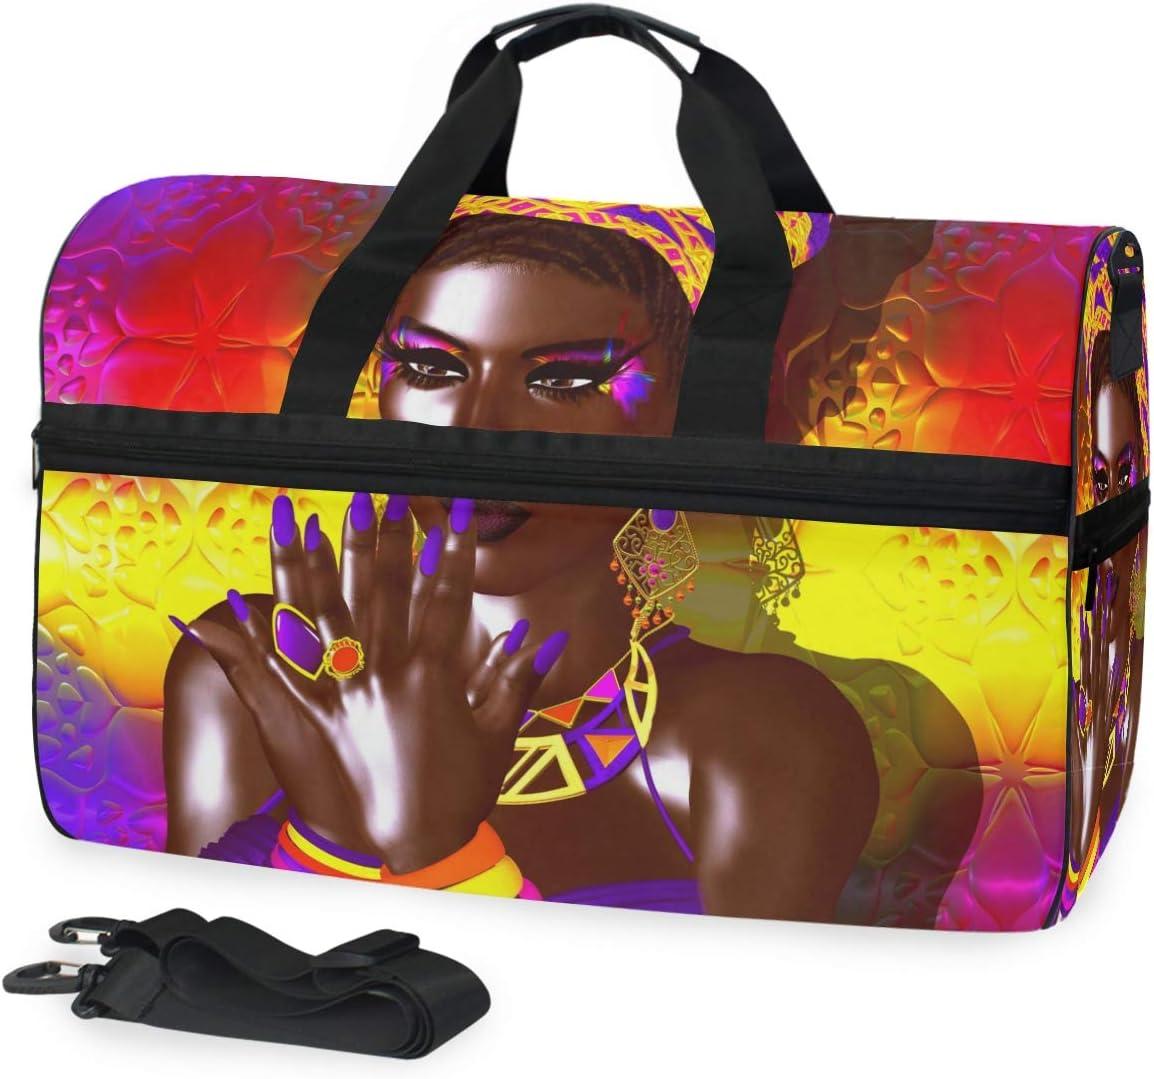 New Shipping Free Travel Duffel Free shipping / New Bag African Woman Waterproof Lightweight American